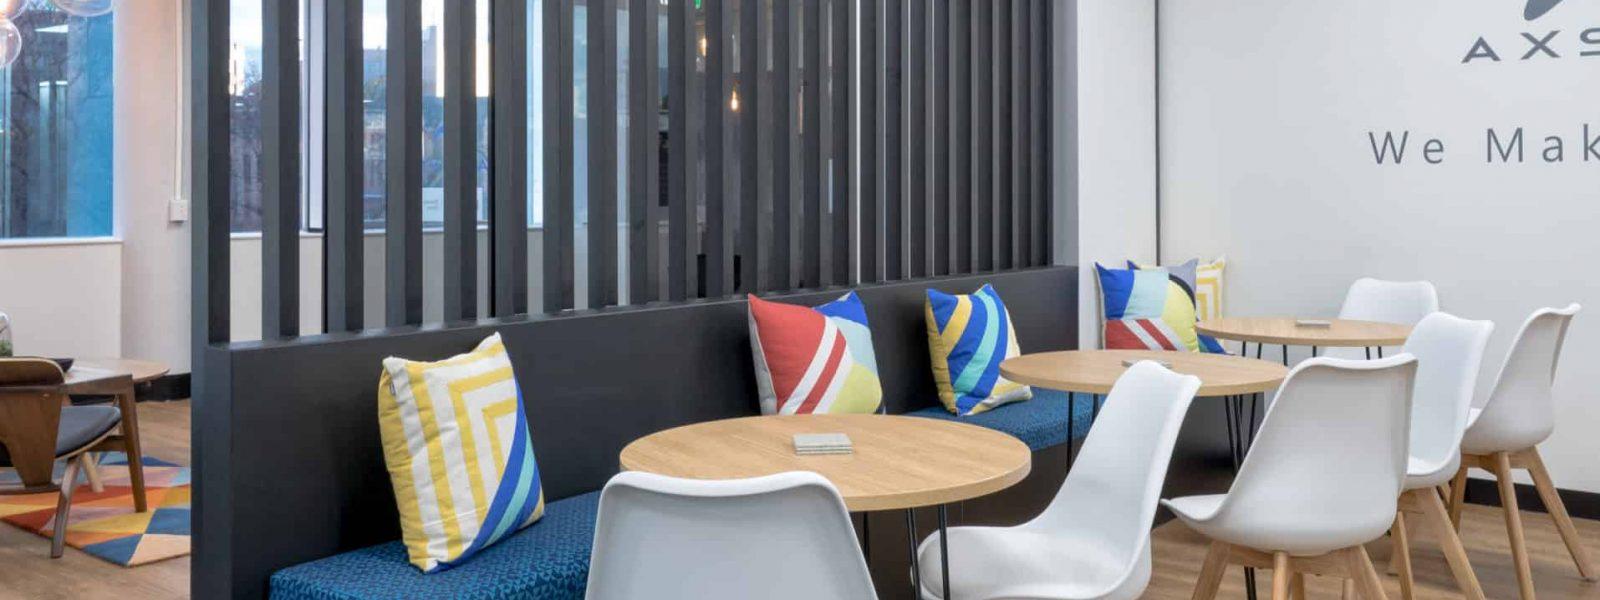 Office Design Interior Melbourne, Axsys | Contour Interiors